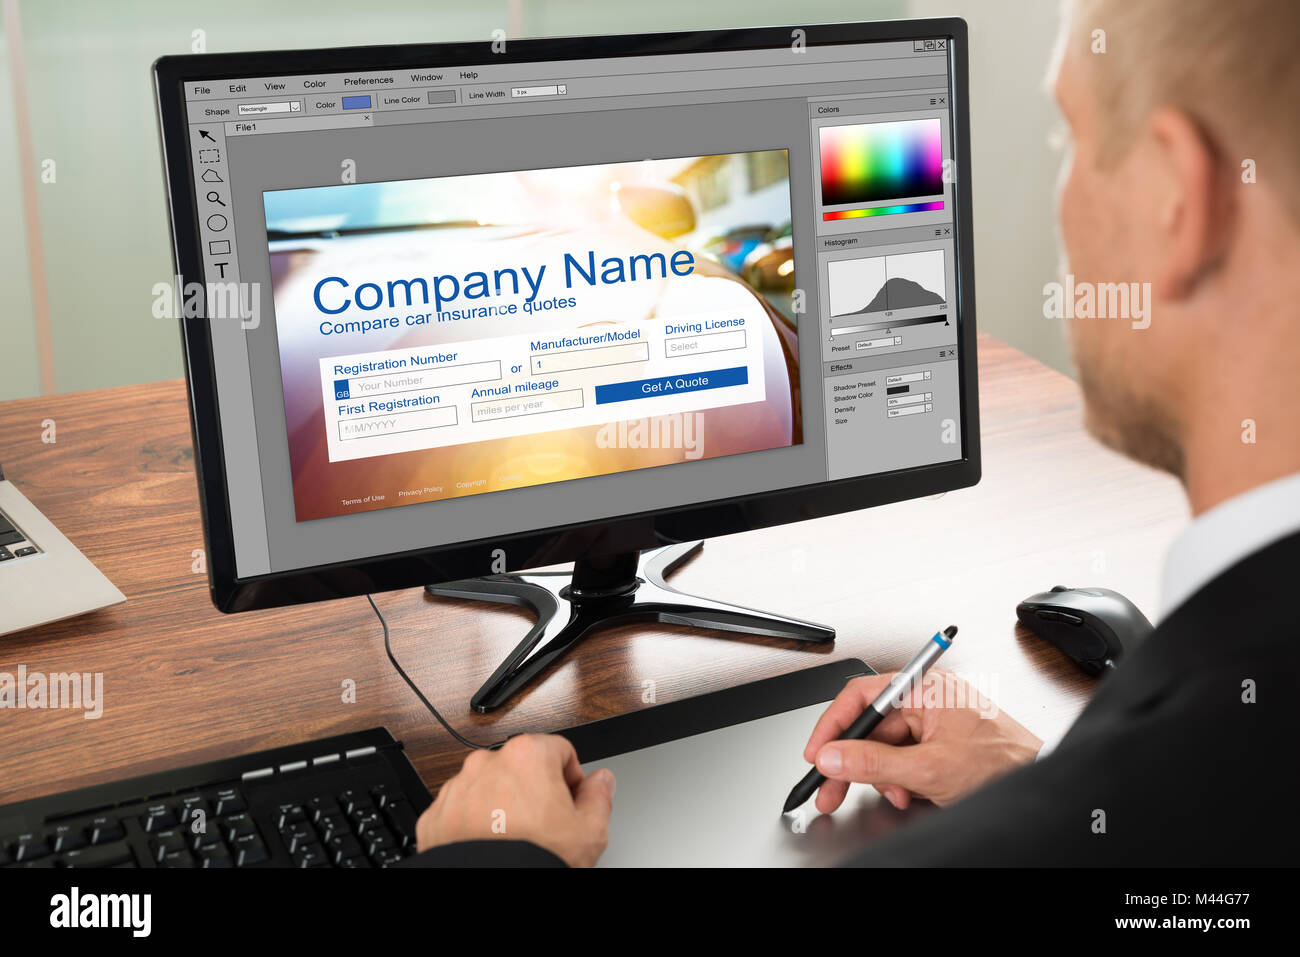 Designer Making Webpage Design On Computer Using Graphic Tablet - Stock Image